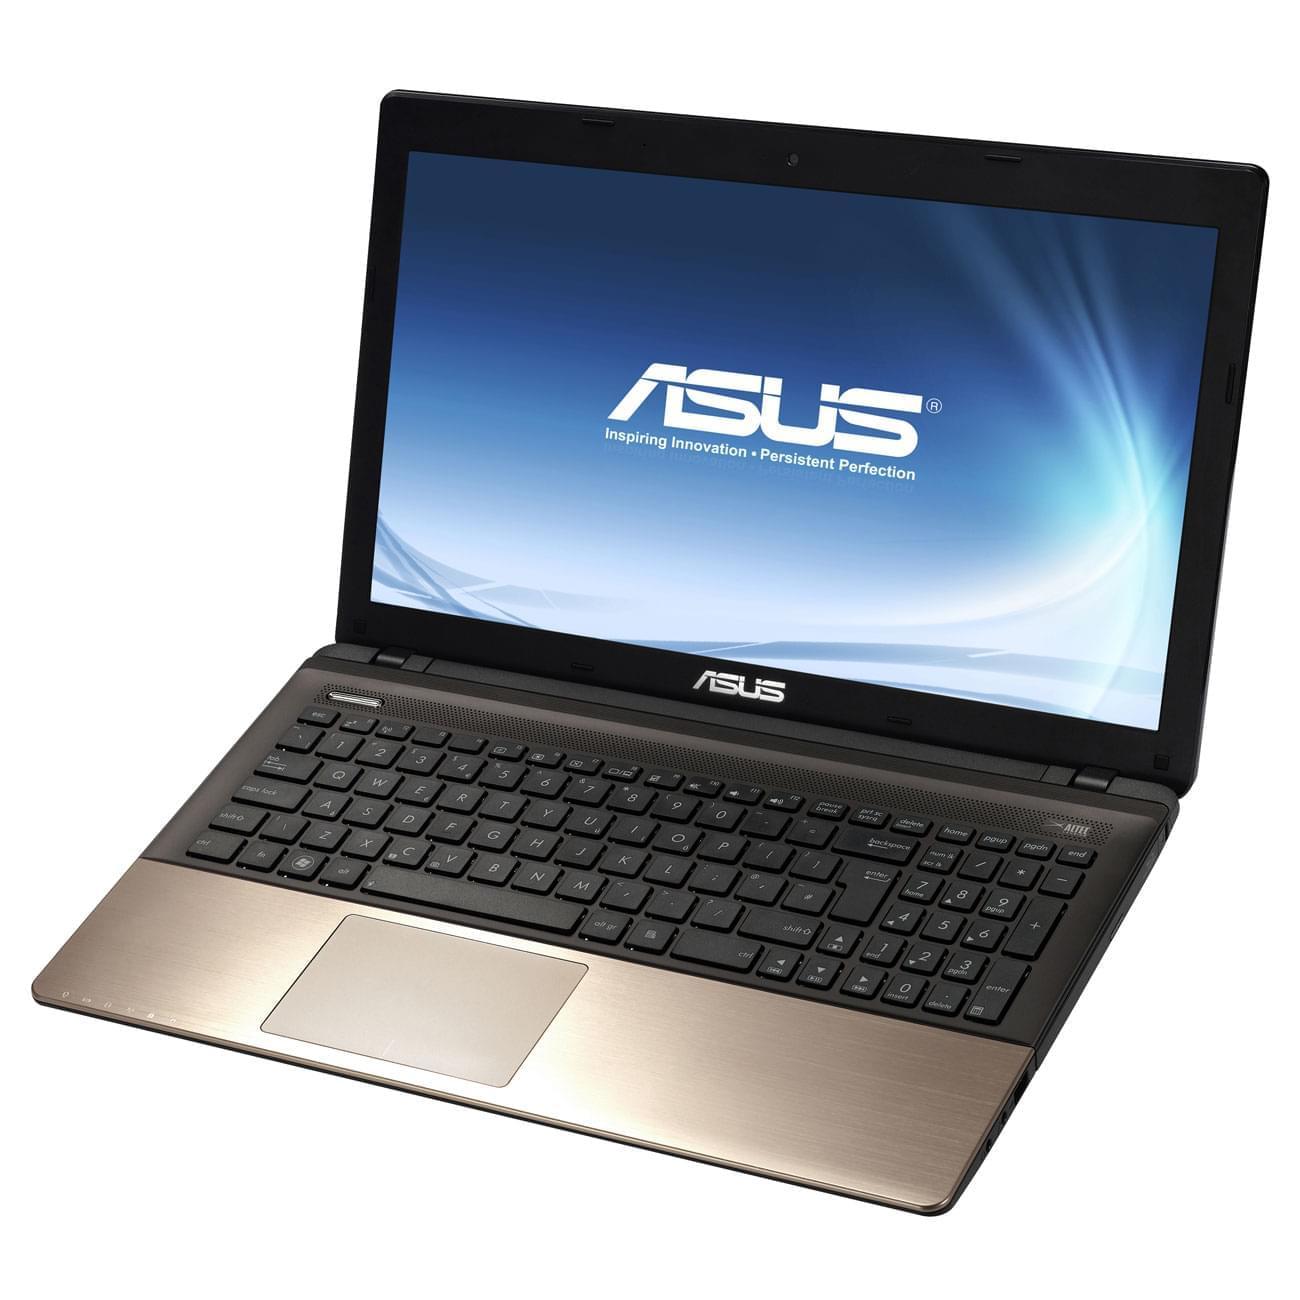 Asus K55VJ-SX038H - PC portable Asus - Cybertek.fr - 0